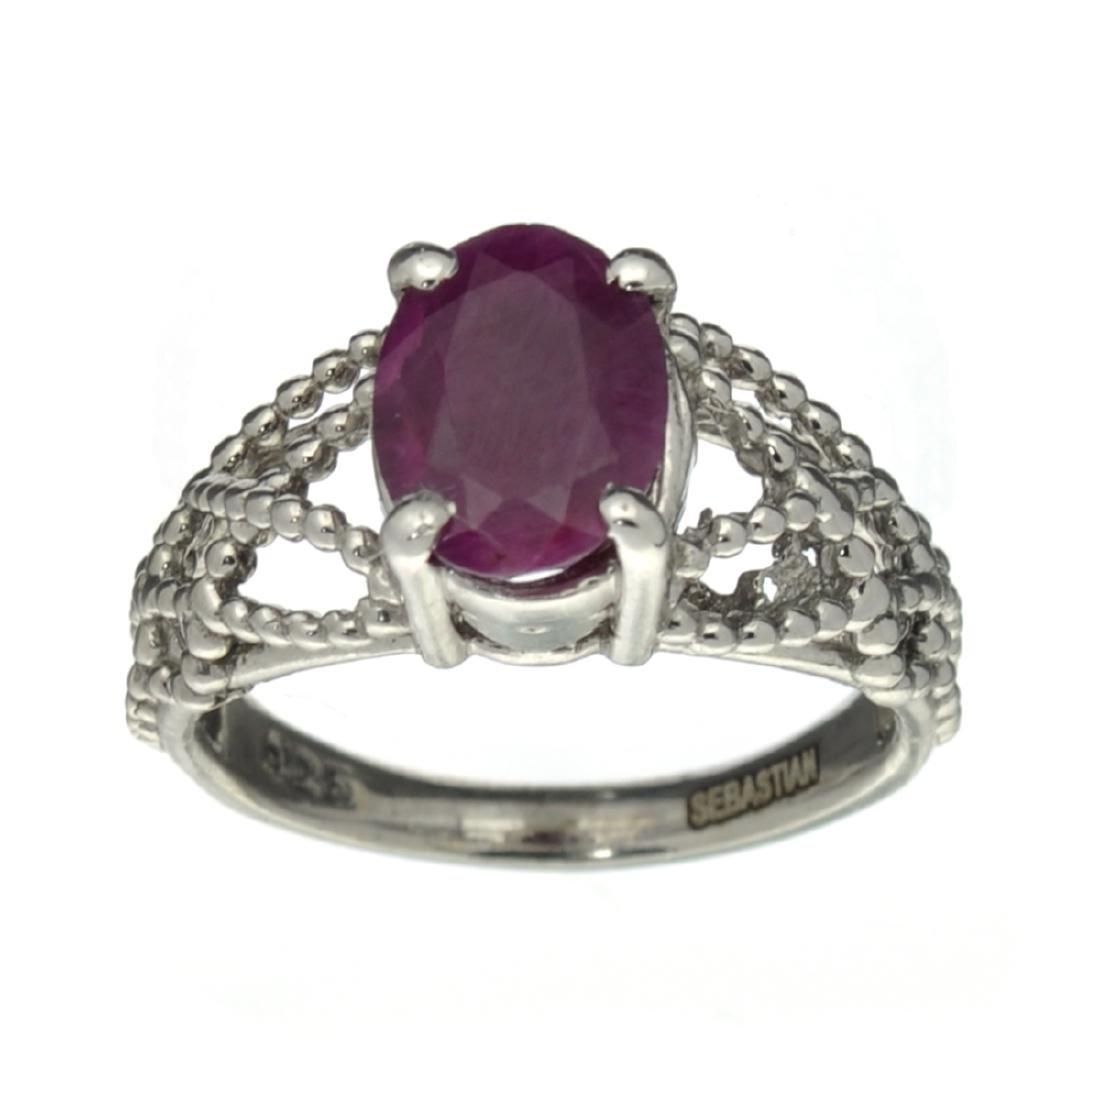 APP: 0.6k Fine Jewelry Designer Sebastian, 2.22CT Oval